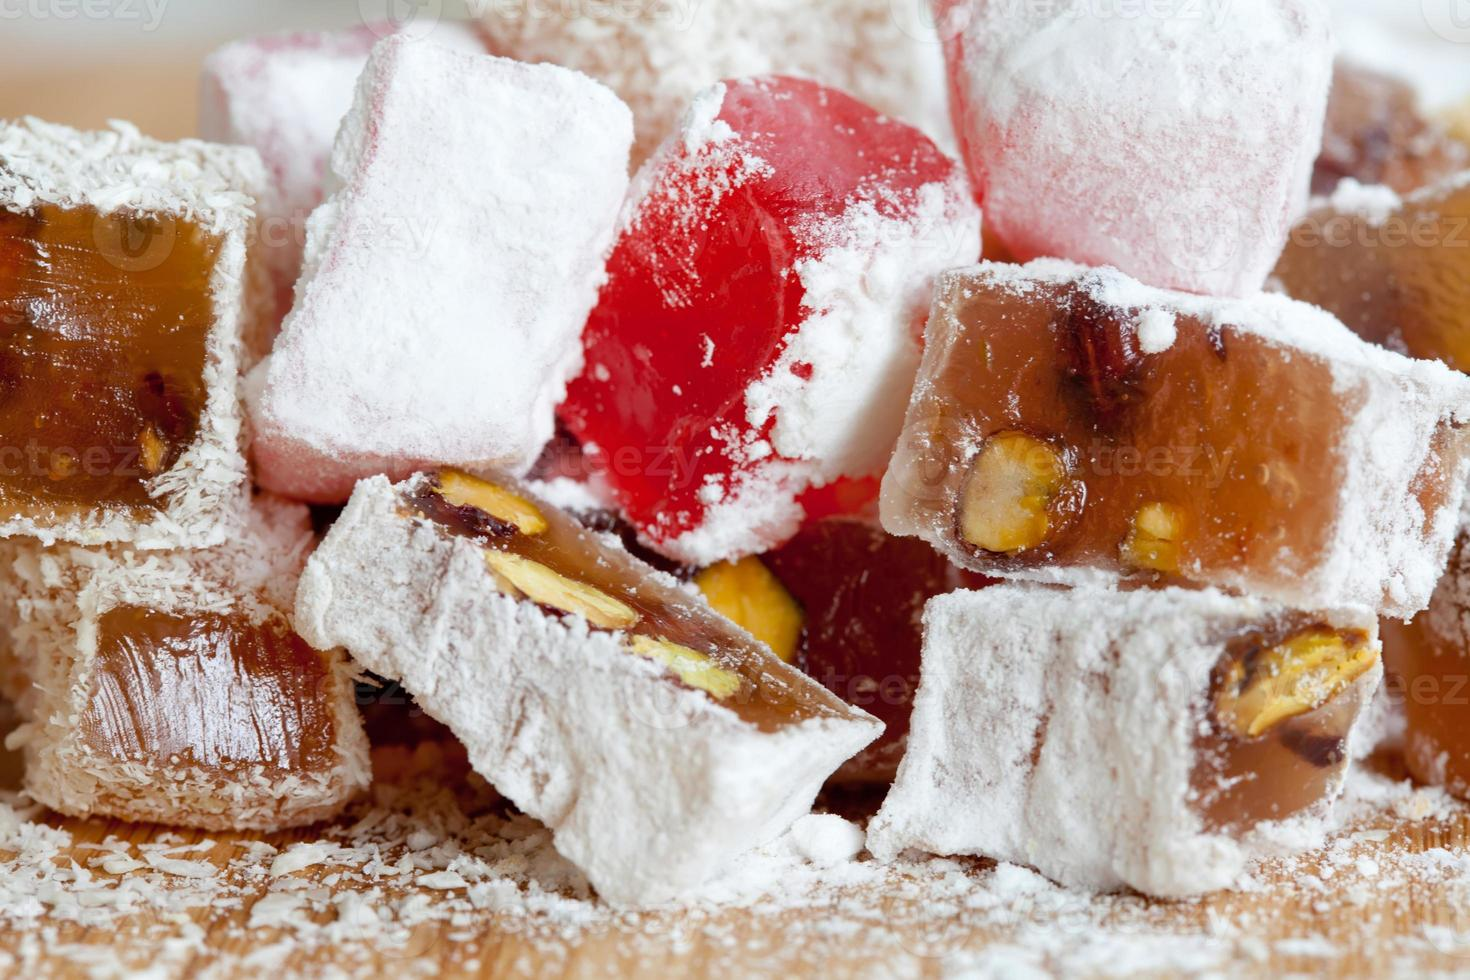 dolce. dolci turchi e arabi. foto